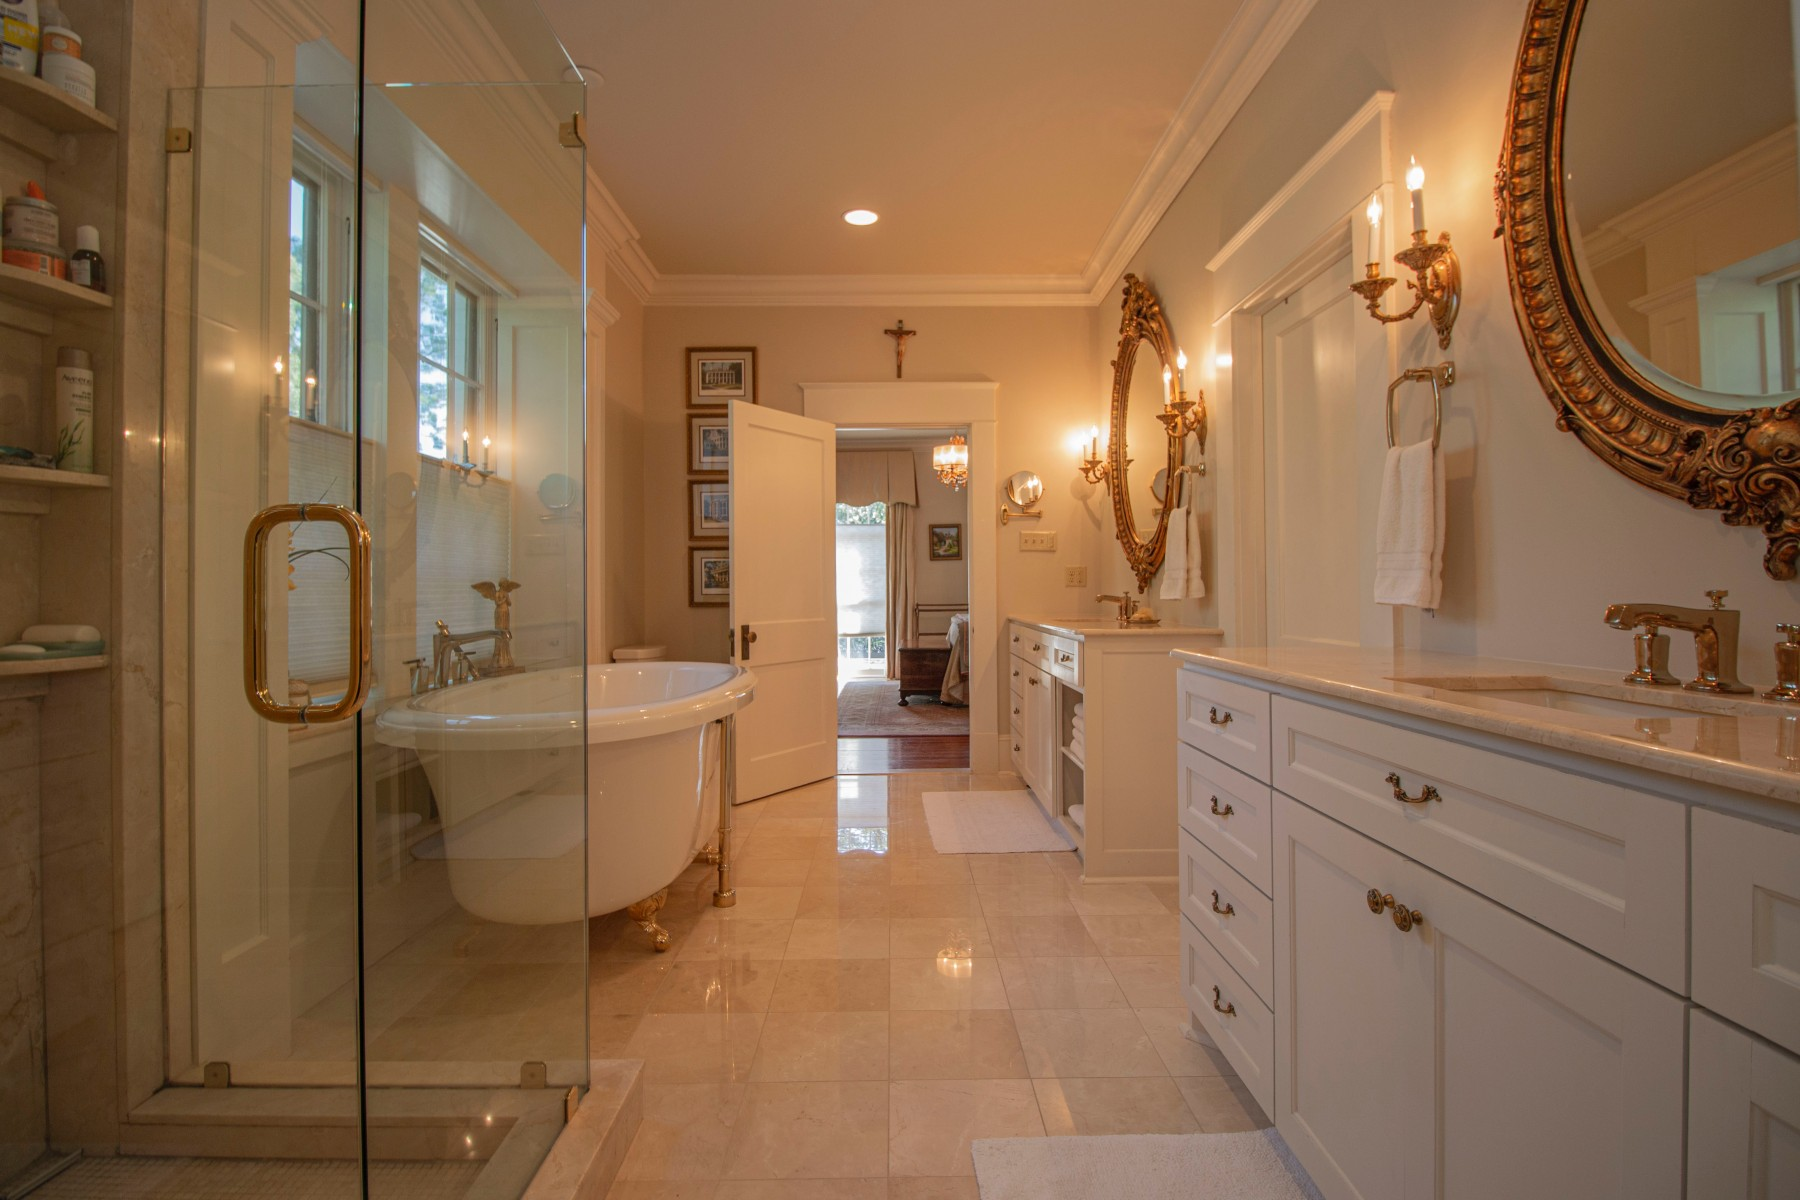 bathroom lighting - Tim Kyle